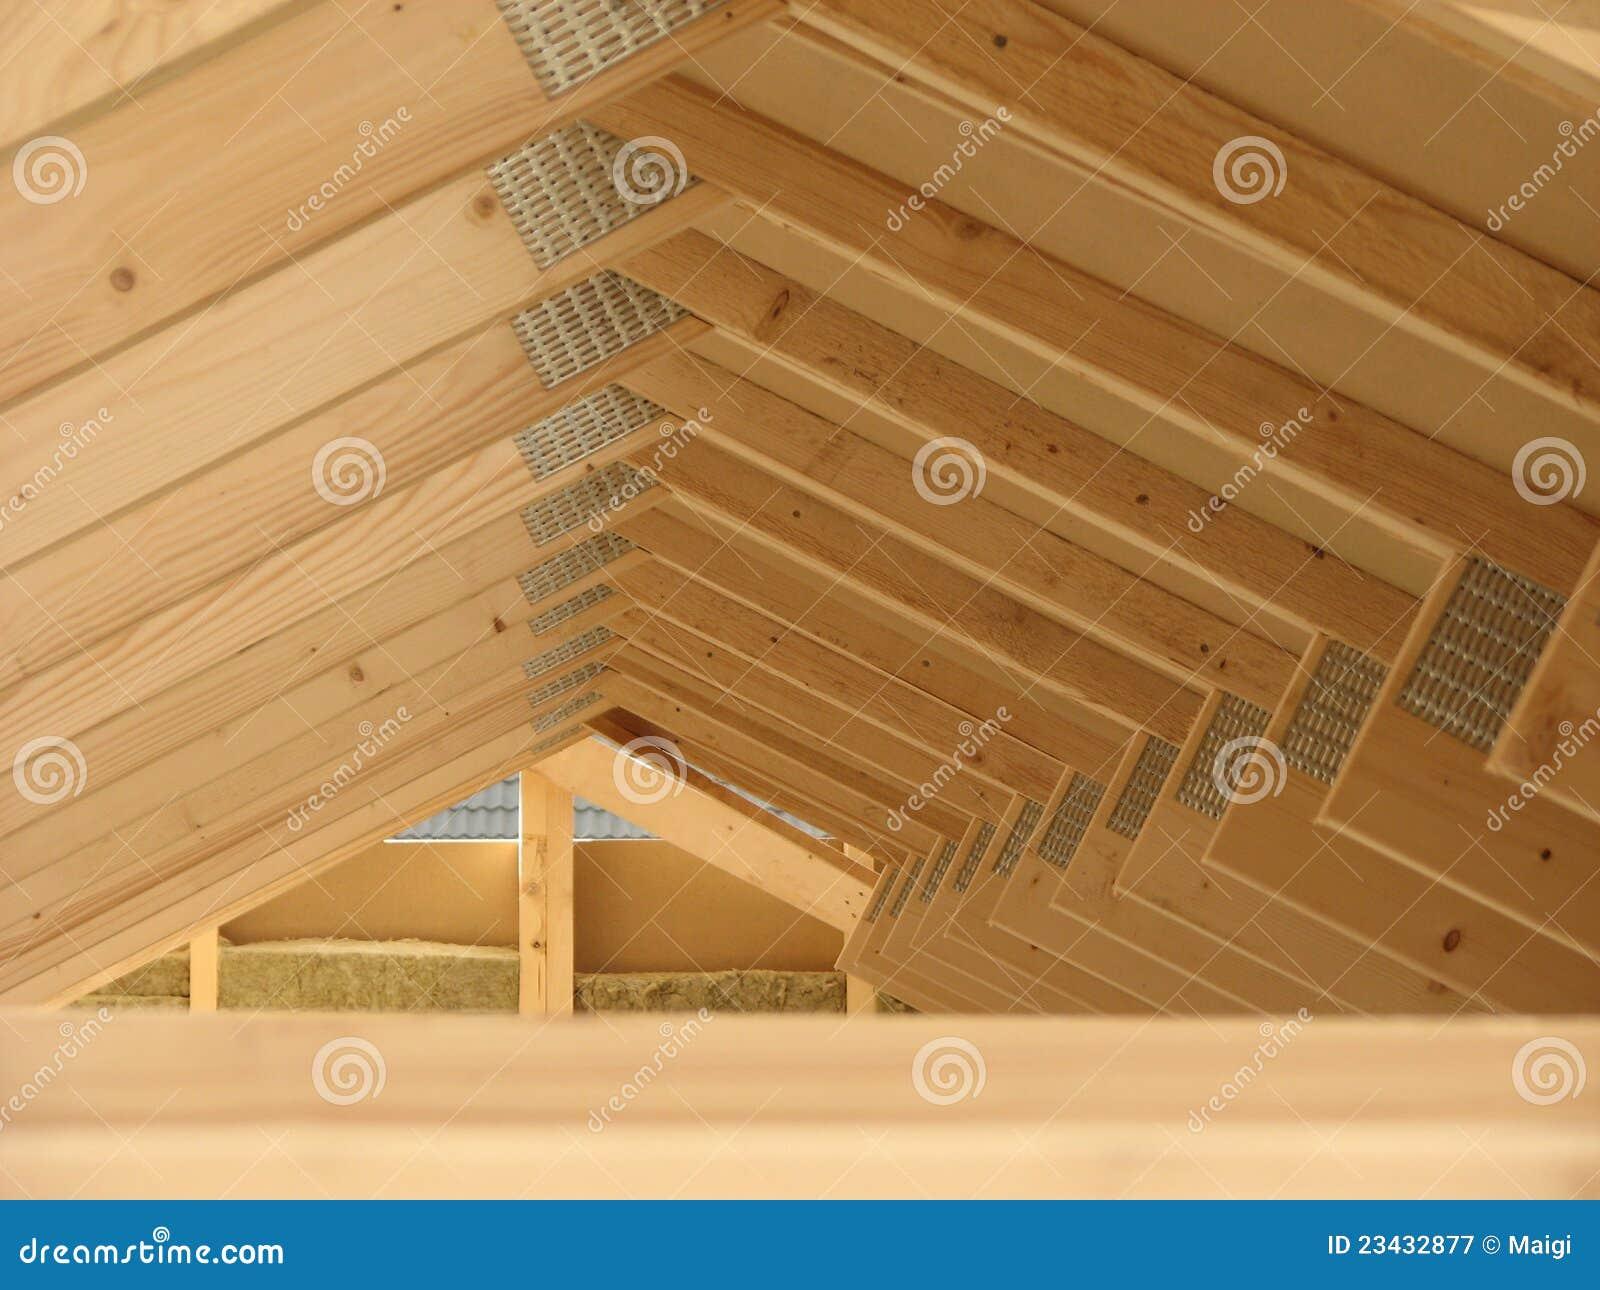 Roof Construction Wooden House Framework